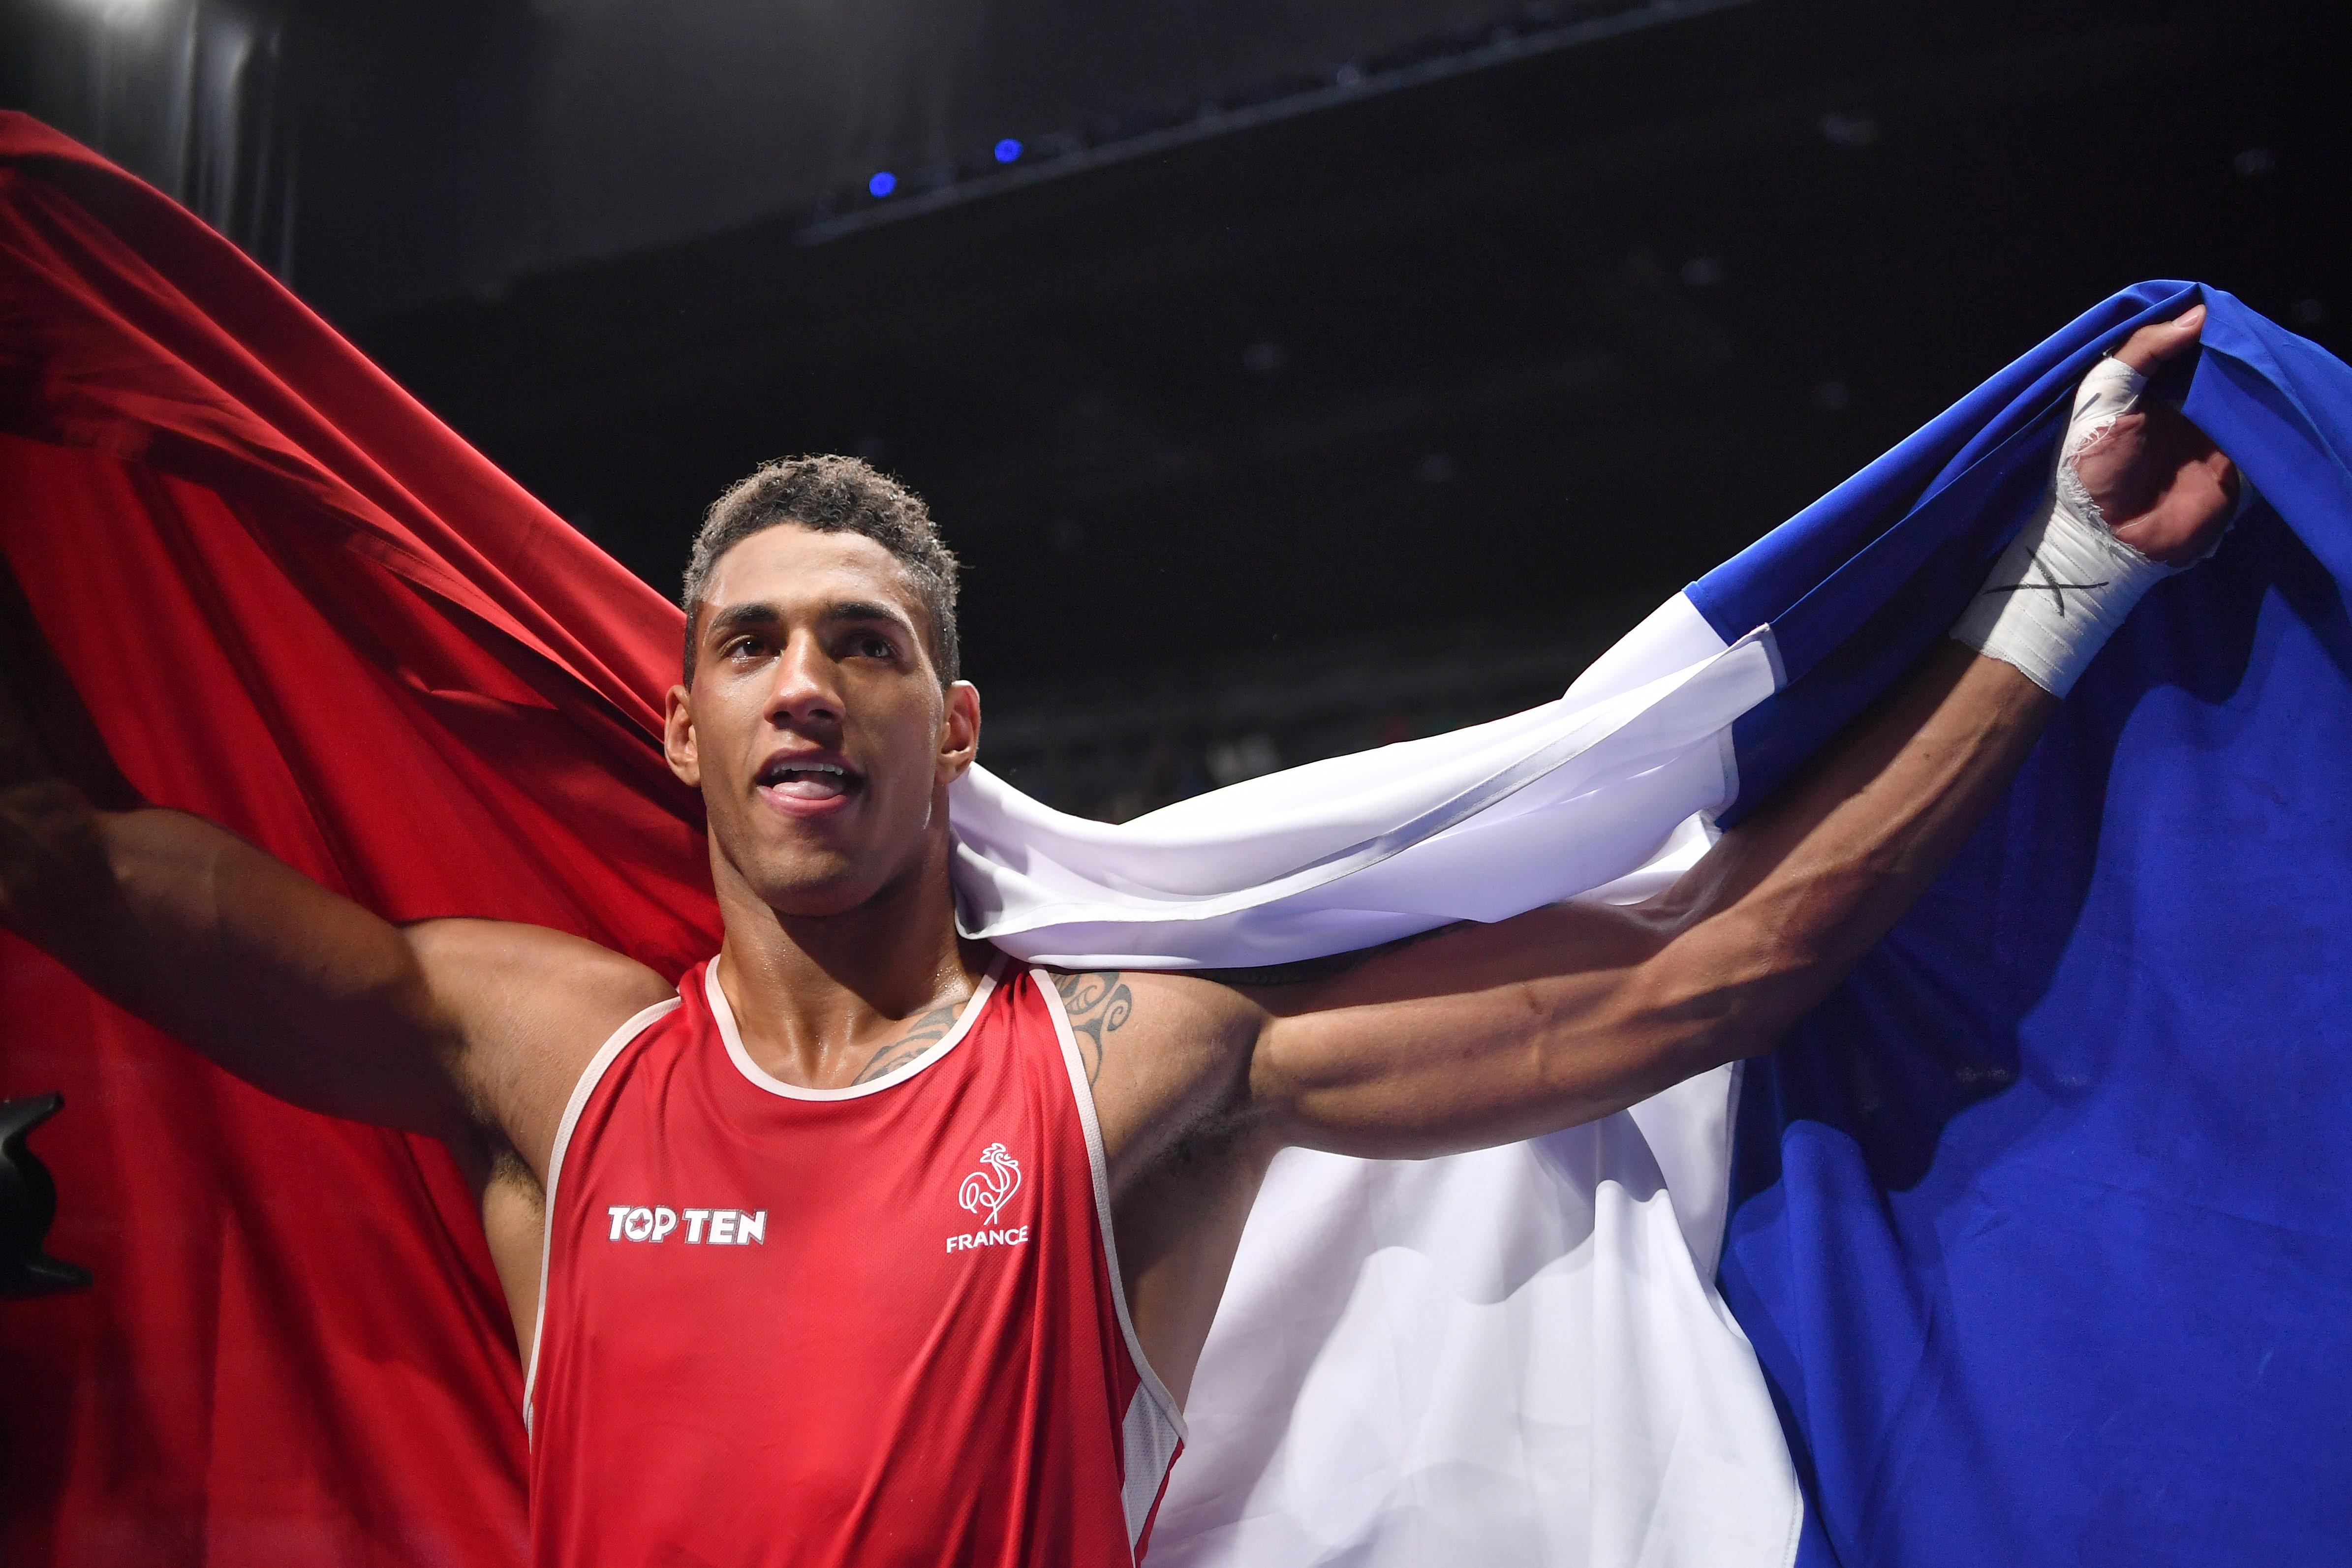 Tony Yoka, dernier médaillé français des Jeux de Rio